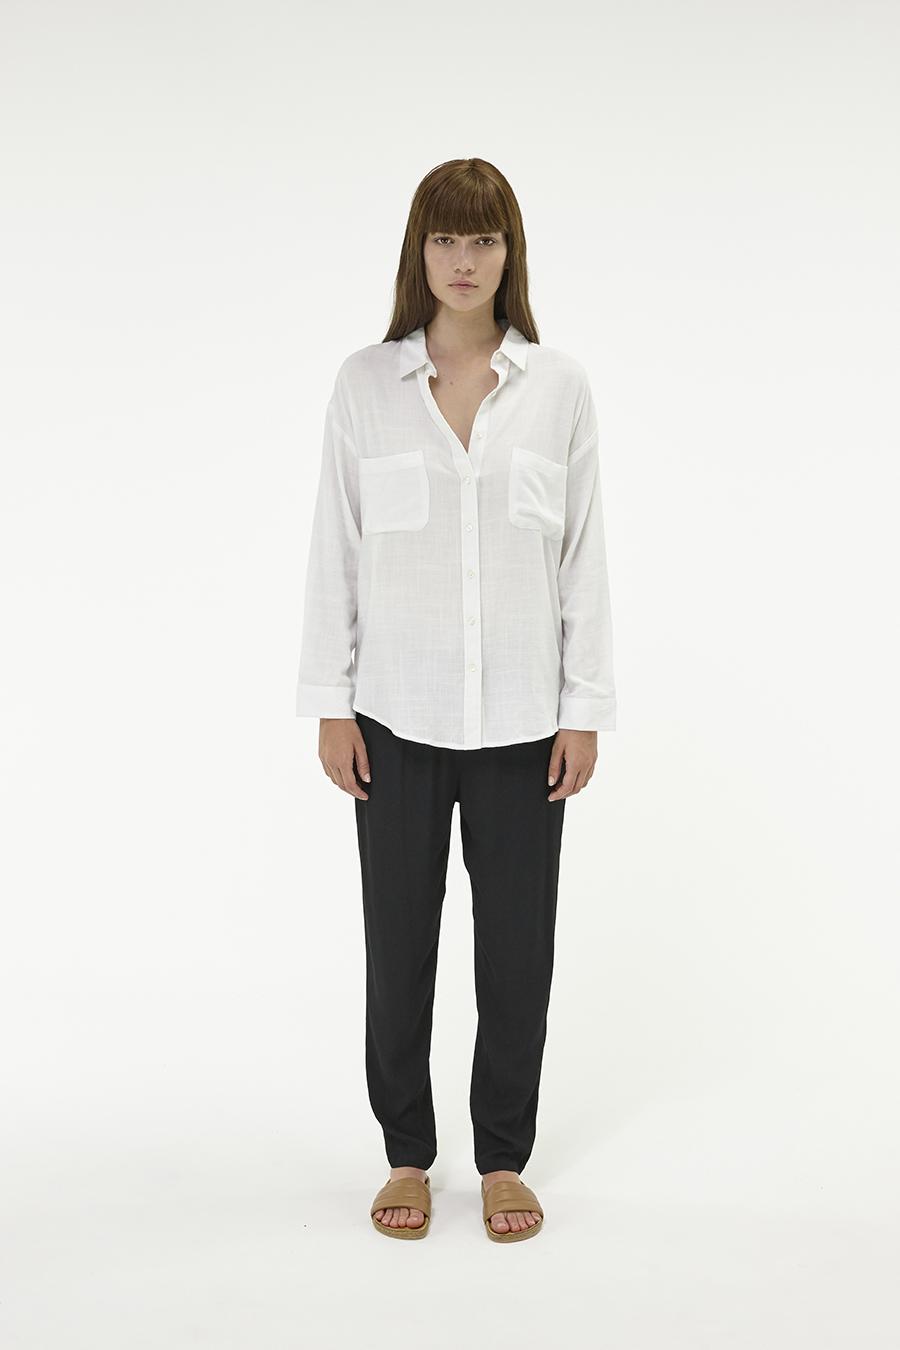 Huffer_Q3-16_W-Rome-Shirt_White-01